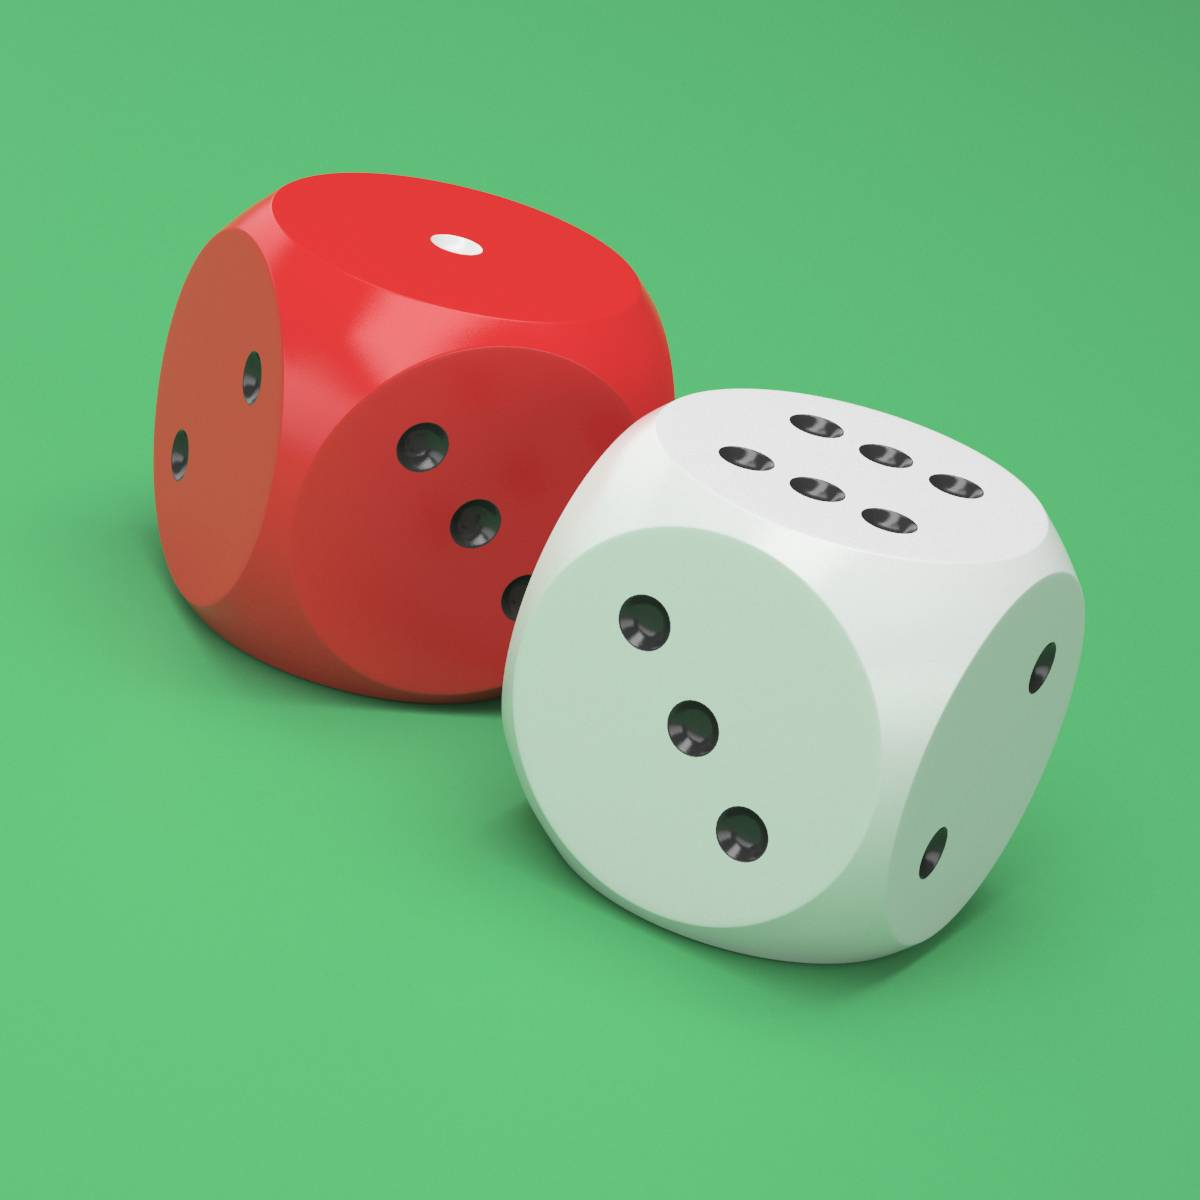 dice_thumb2